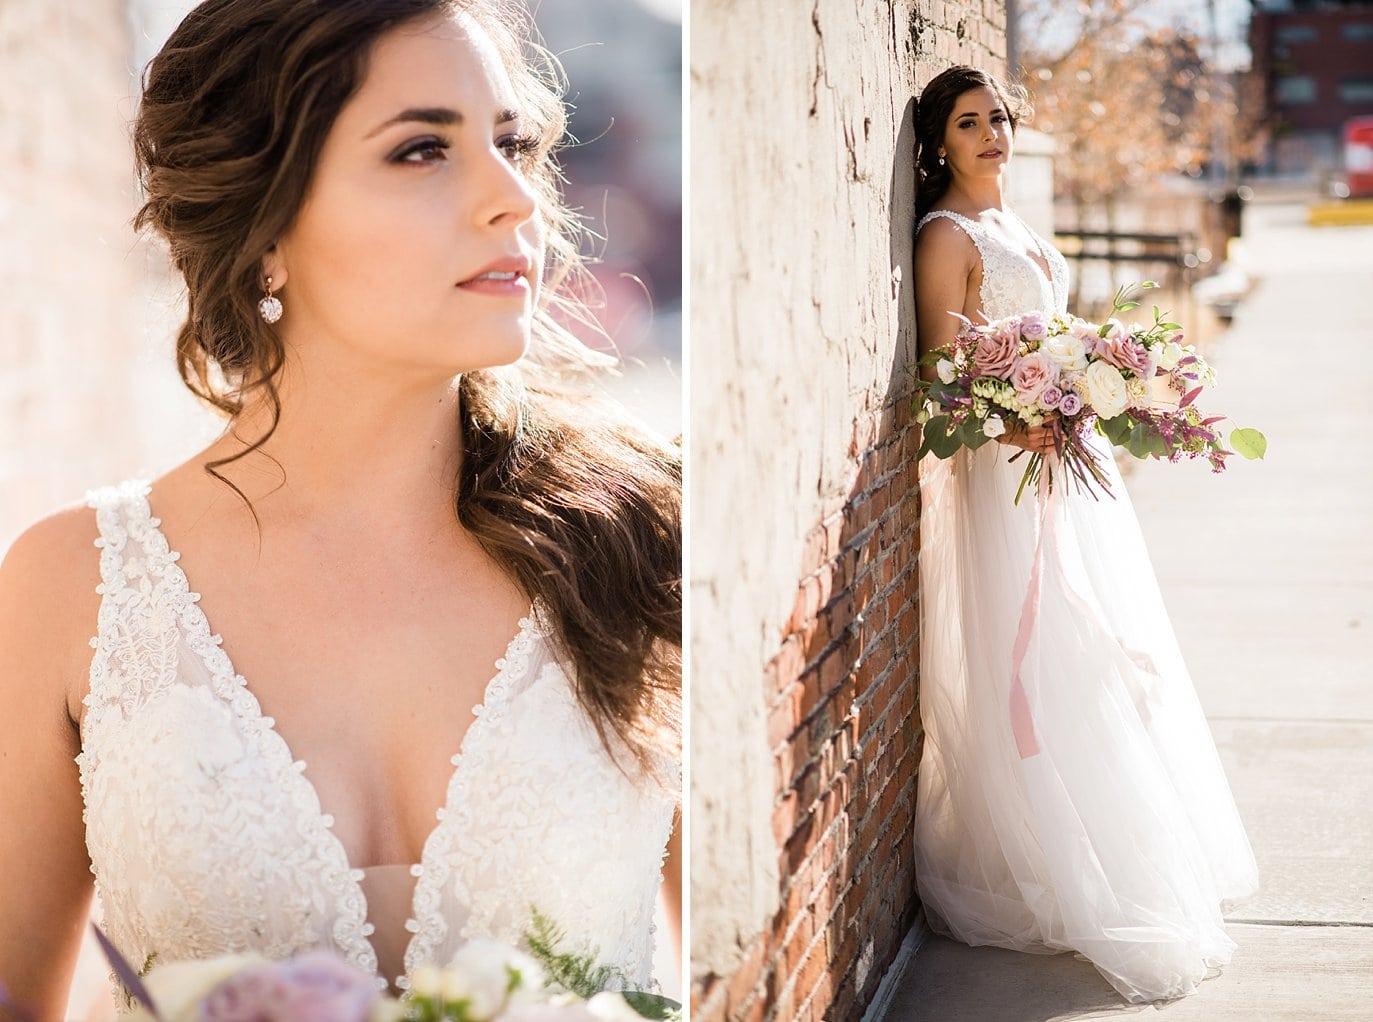 bride in beaded v-neck dress with soft half up bridal updo at Shyft Denver wedding by Boulder Wedding photographer Jennie Crate photographer